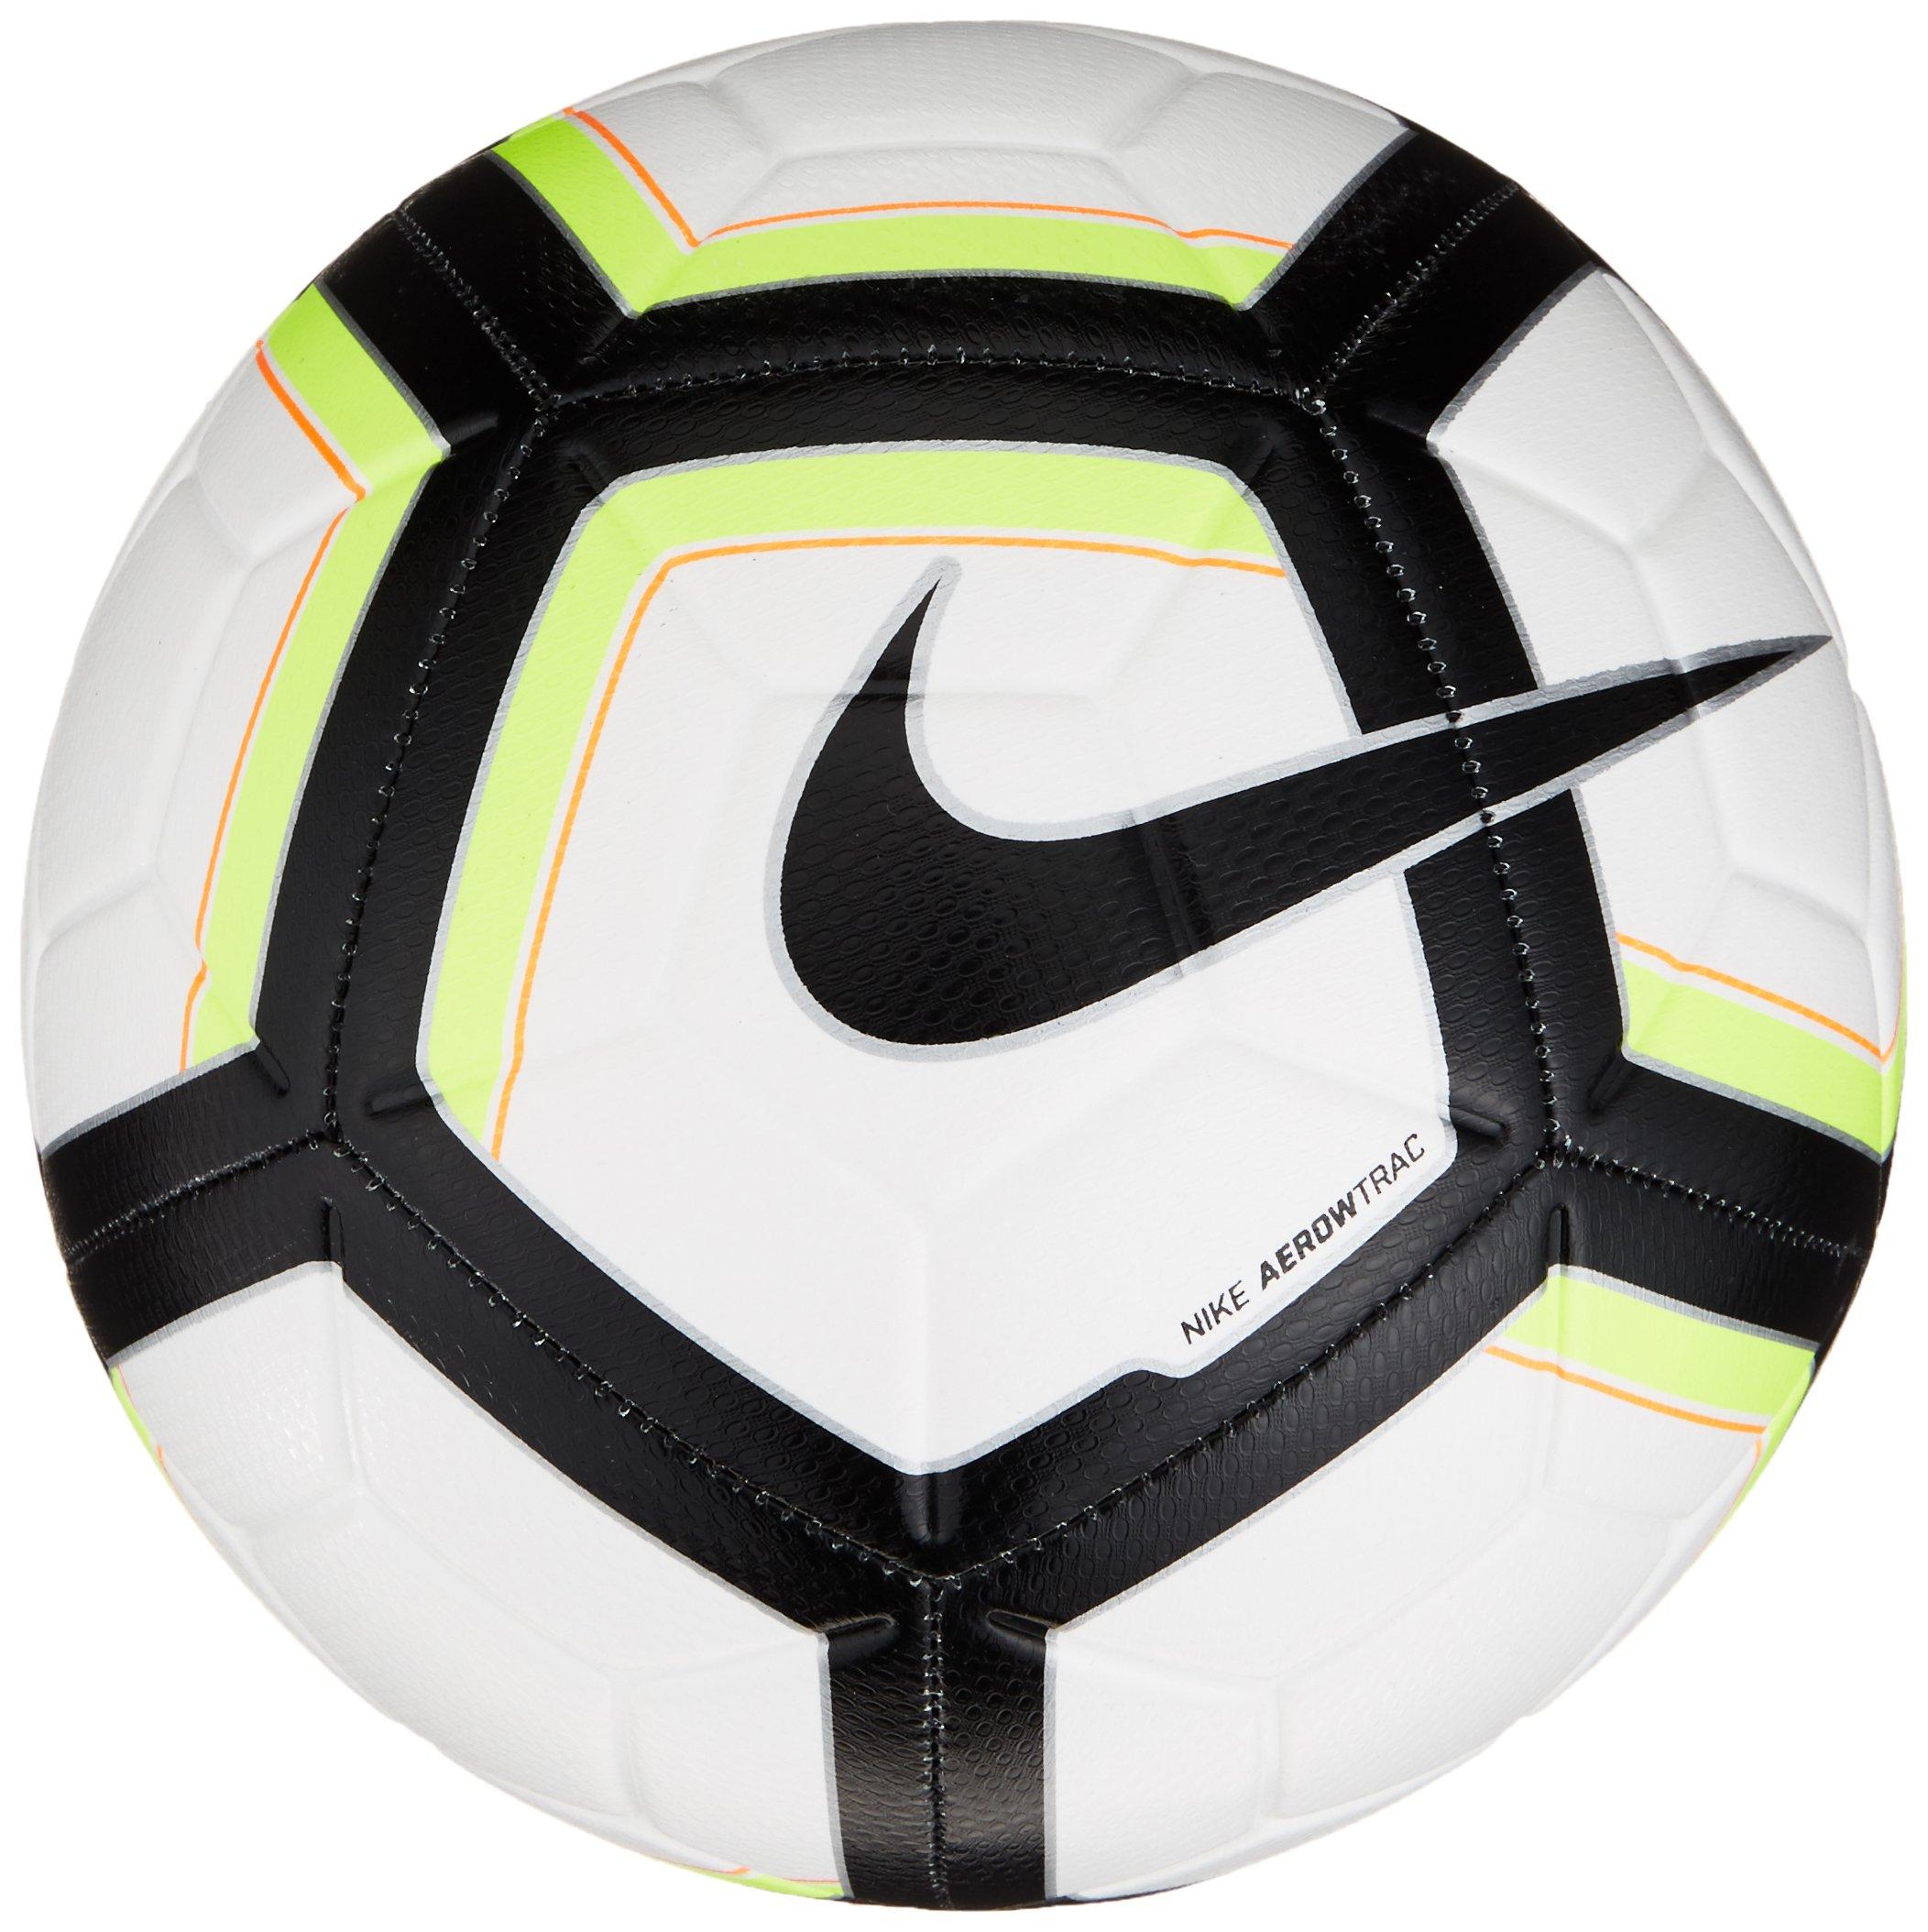 544ce6fddfb54 NIKE Strike Football Soccer Ball - TiendaMIA.com